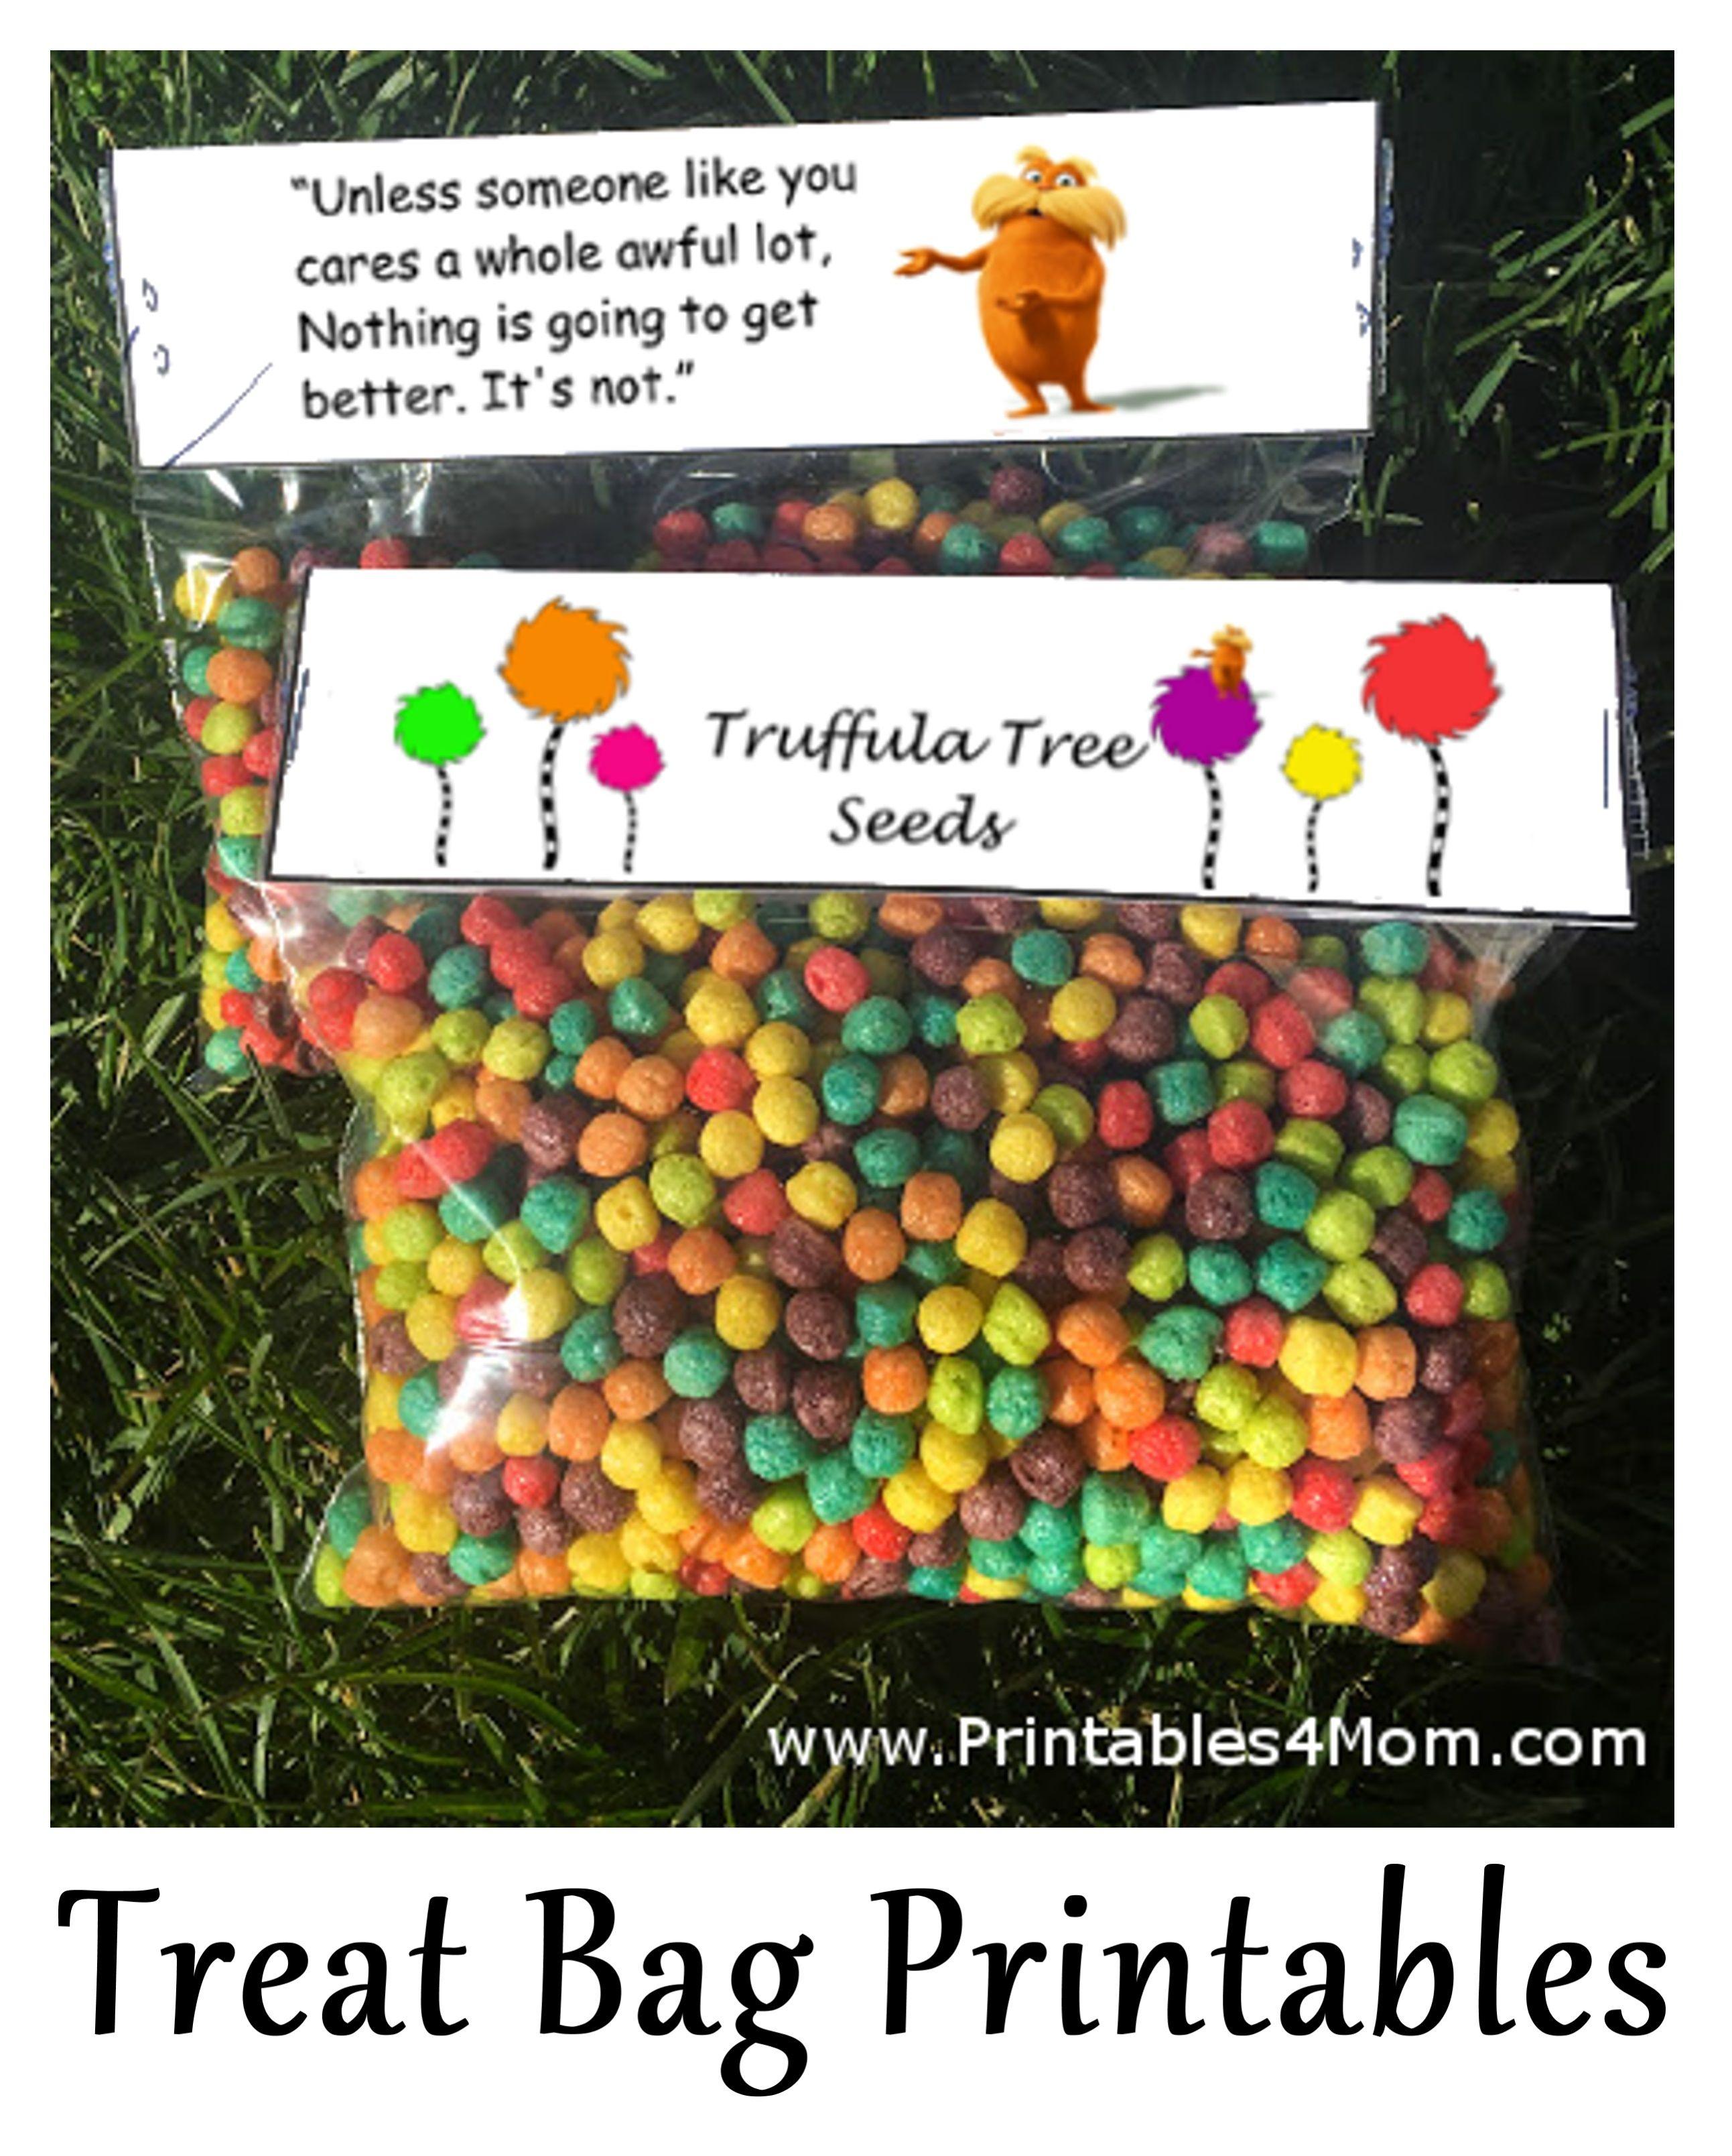 Truffula Tree Seeds Printable Toppers